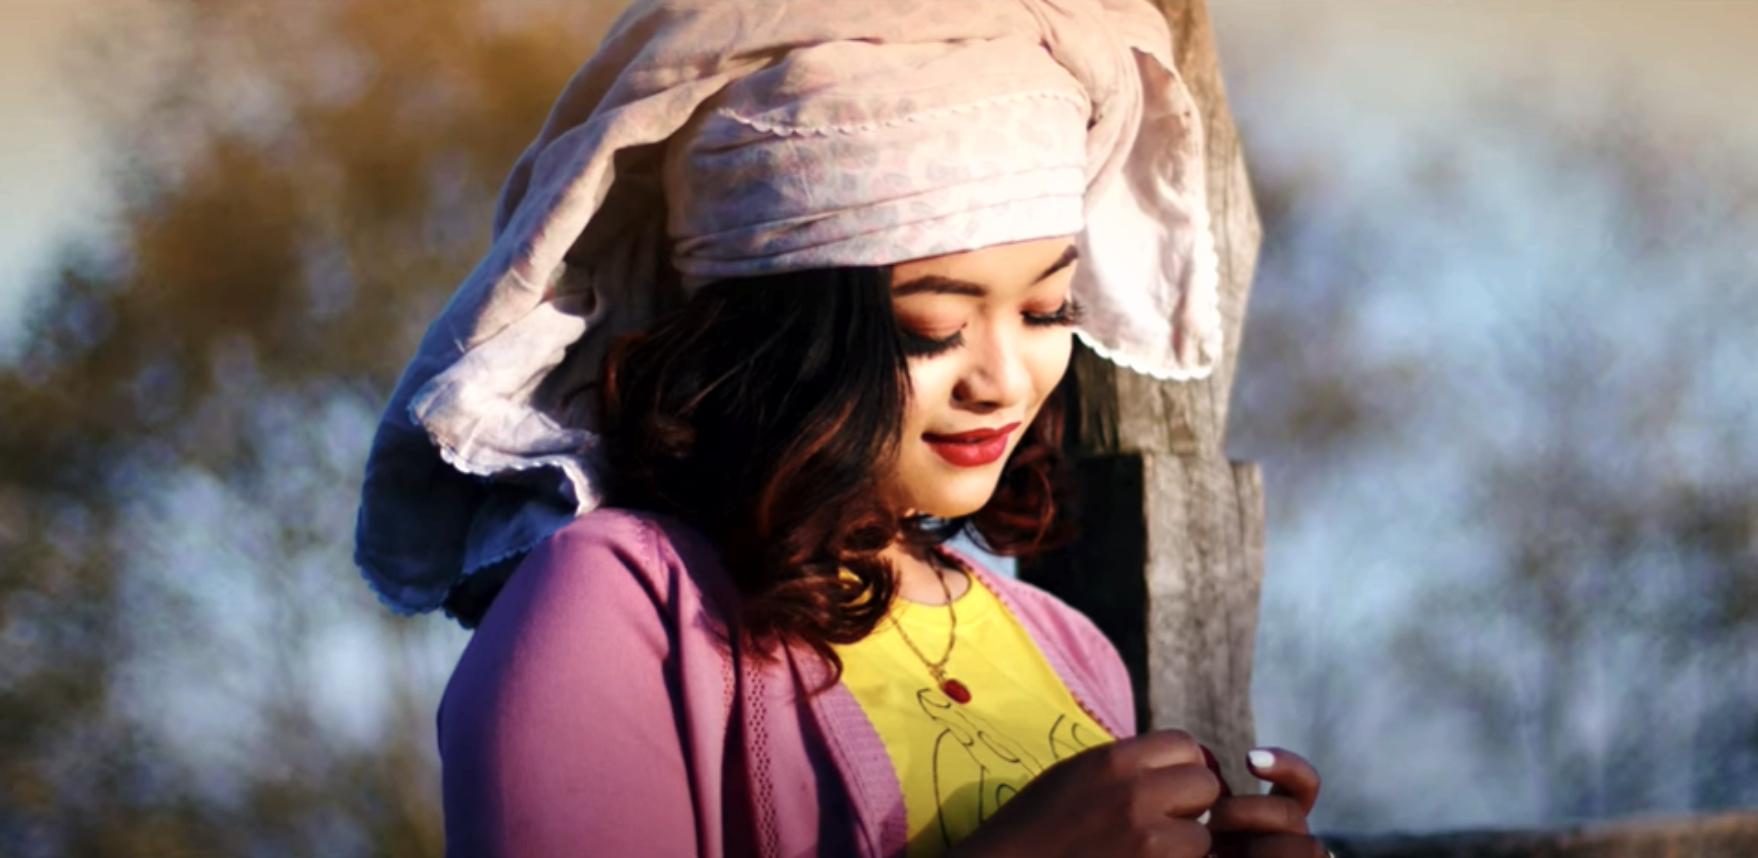 केन्जल र दुर्गा अभिनित 'अक्खे लरिक' सार्वजनिक(भिडियो सहित)